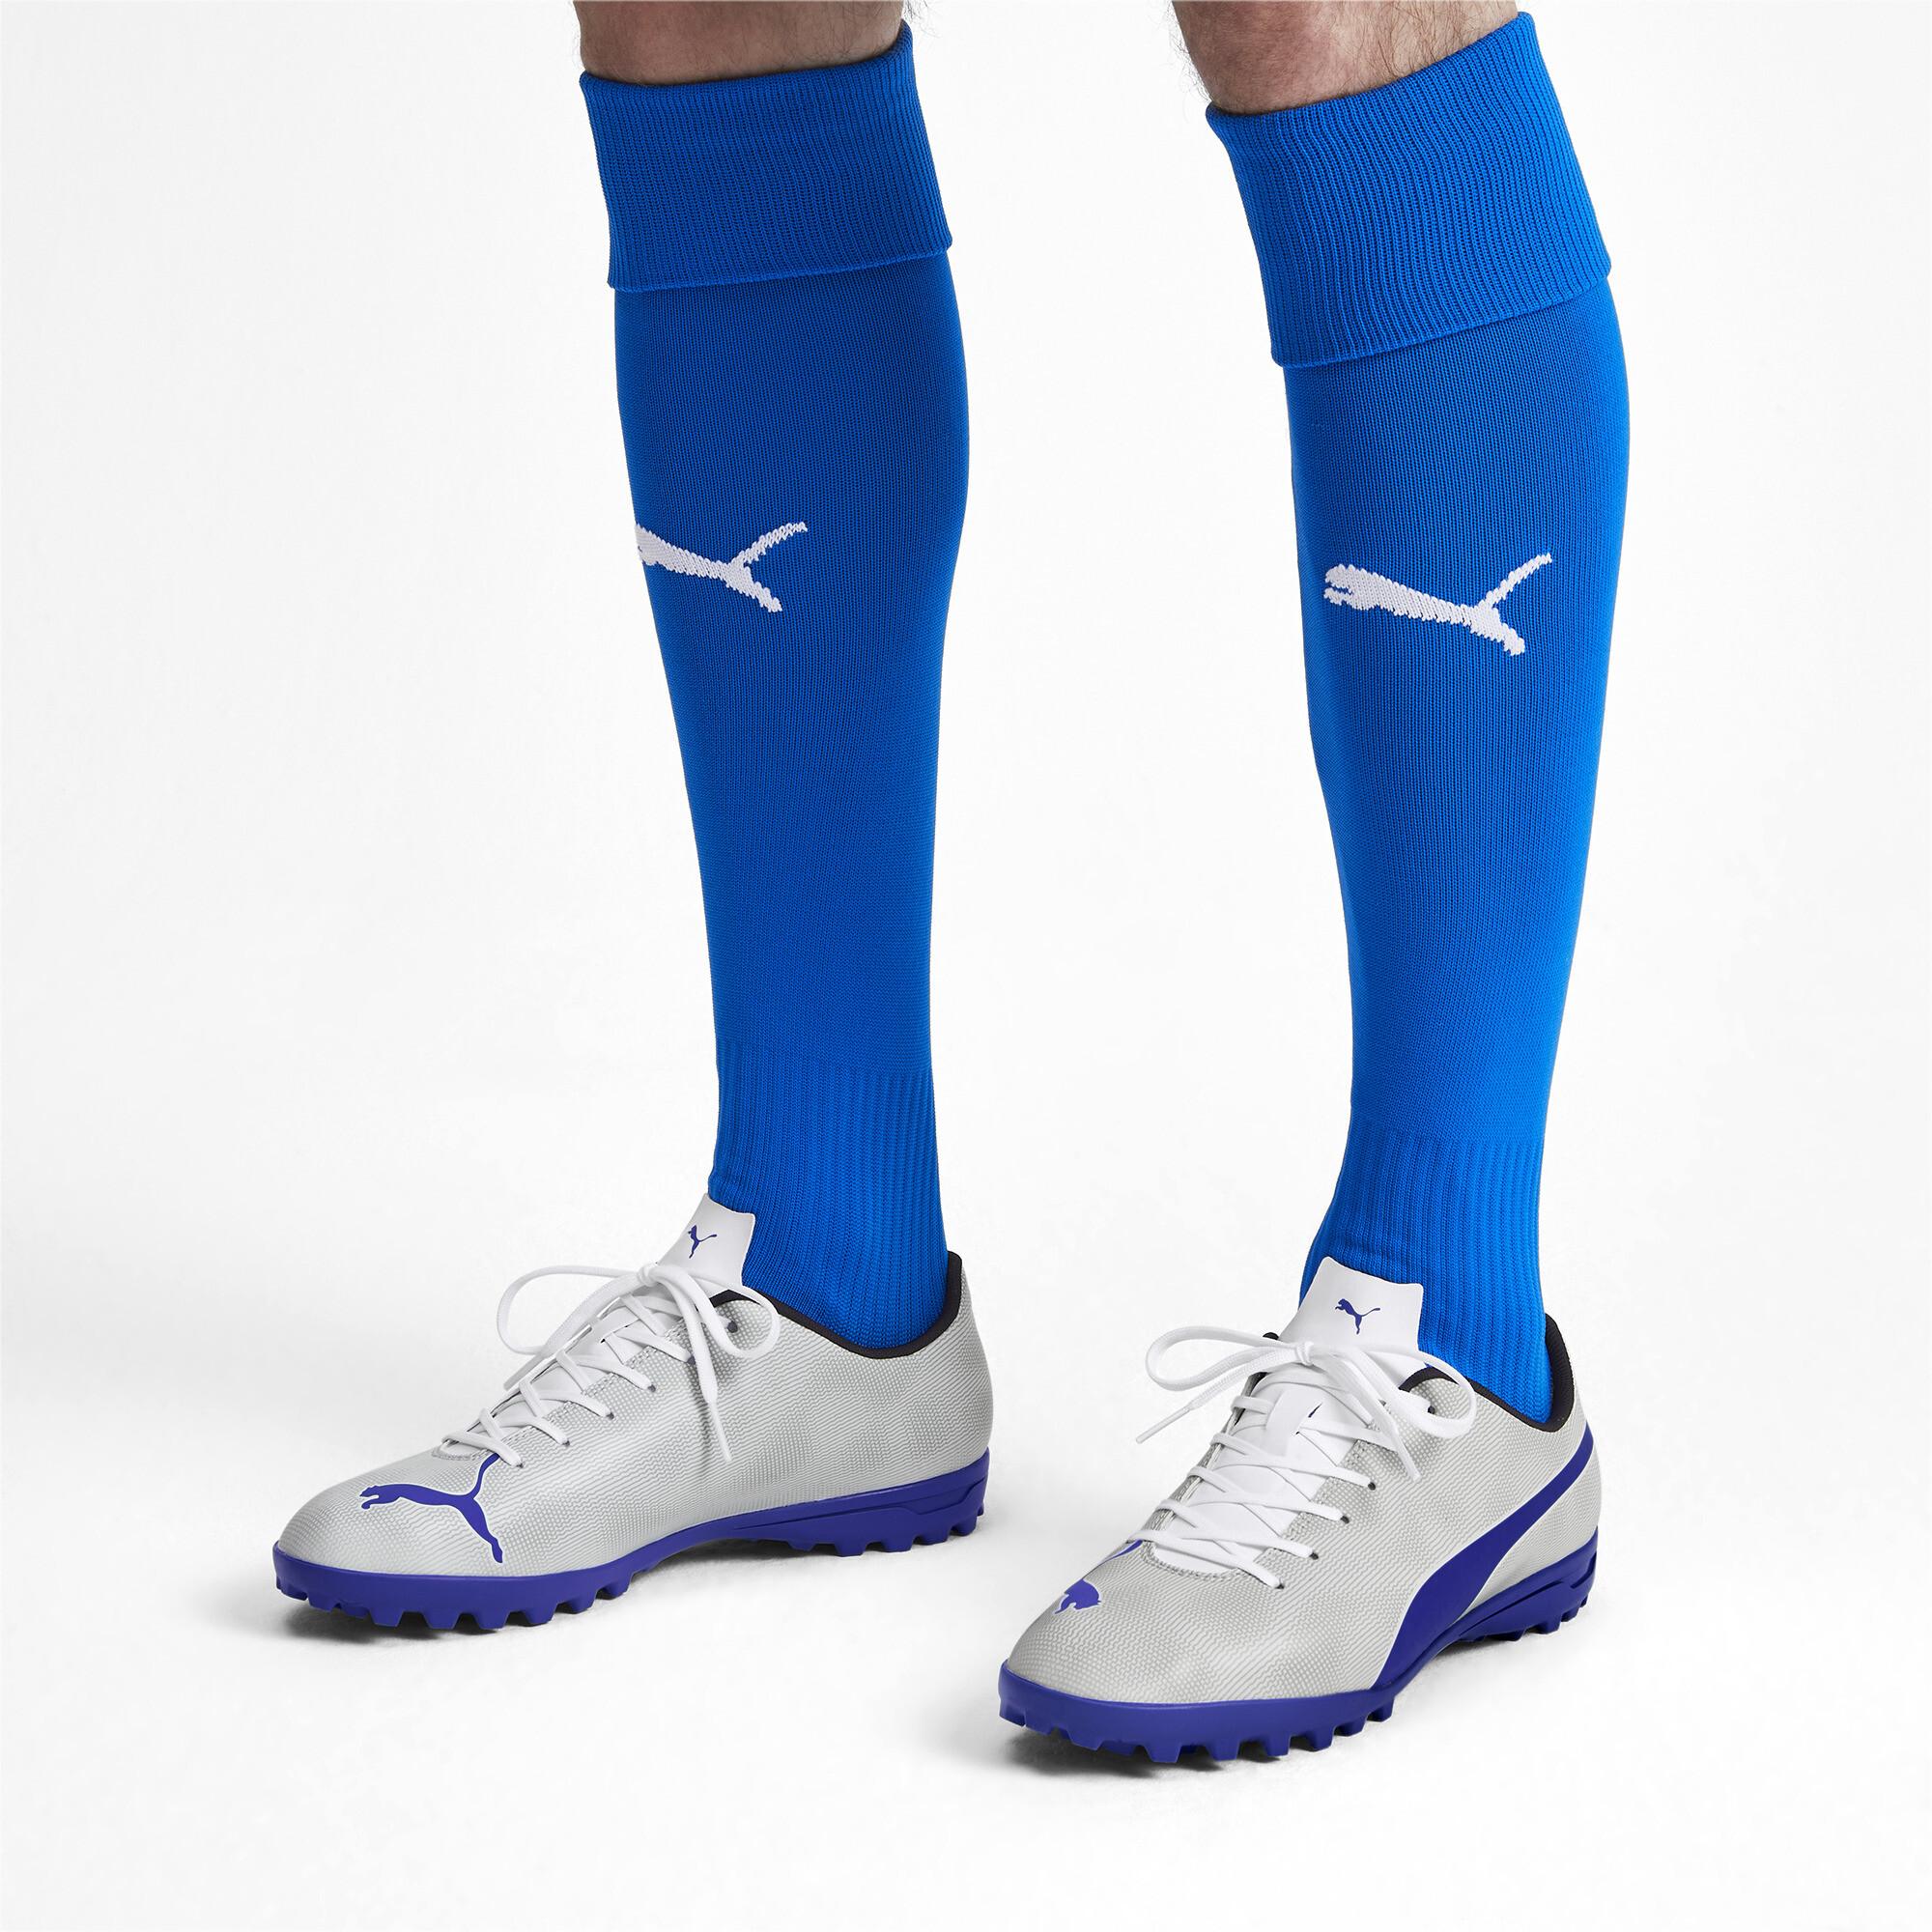 PUMA-Rapido-TT-Men-s-Soccer-Cleats-Men-Shoe-Football thumbnail 12